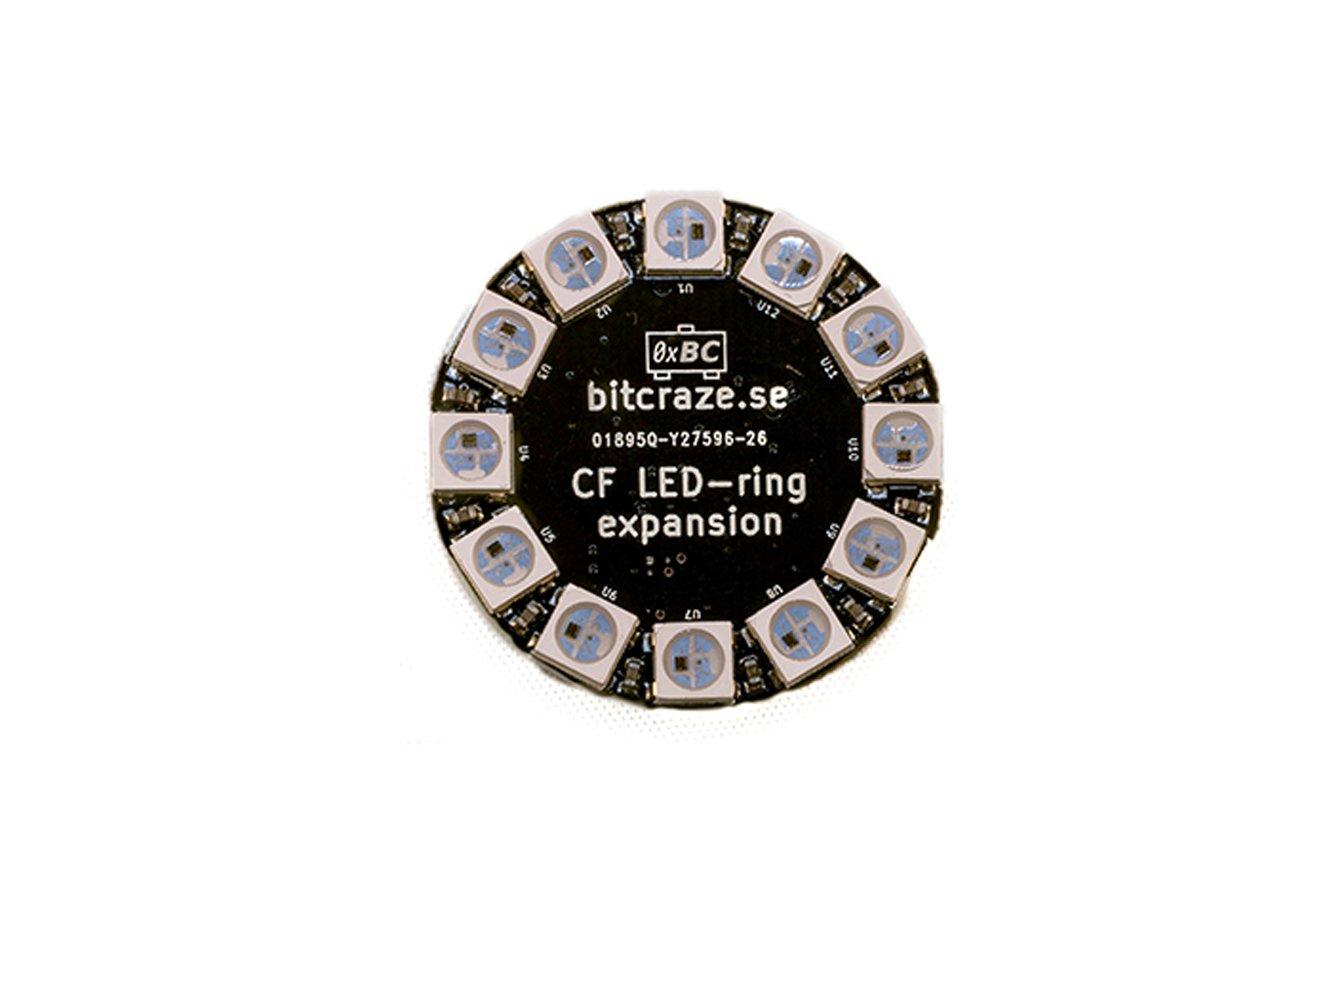 Crazyflie 2.0 Led-Ring Expansion Board(Led Extended Rings)3G